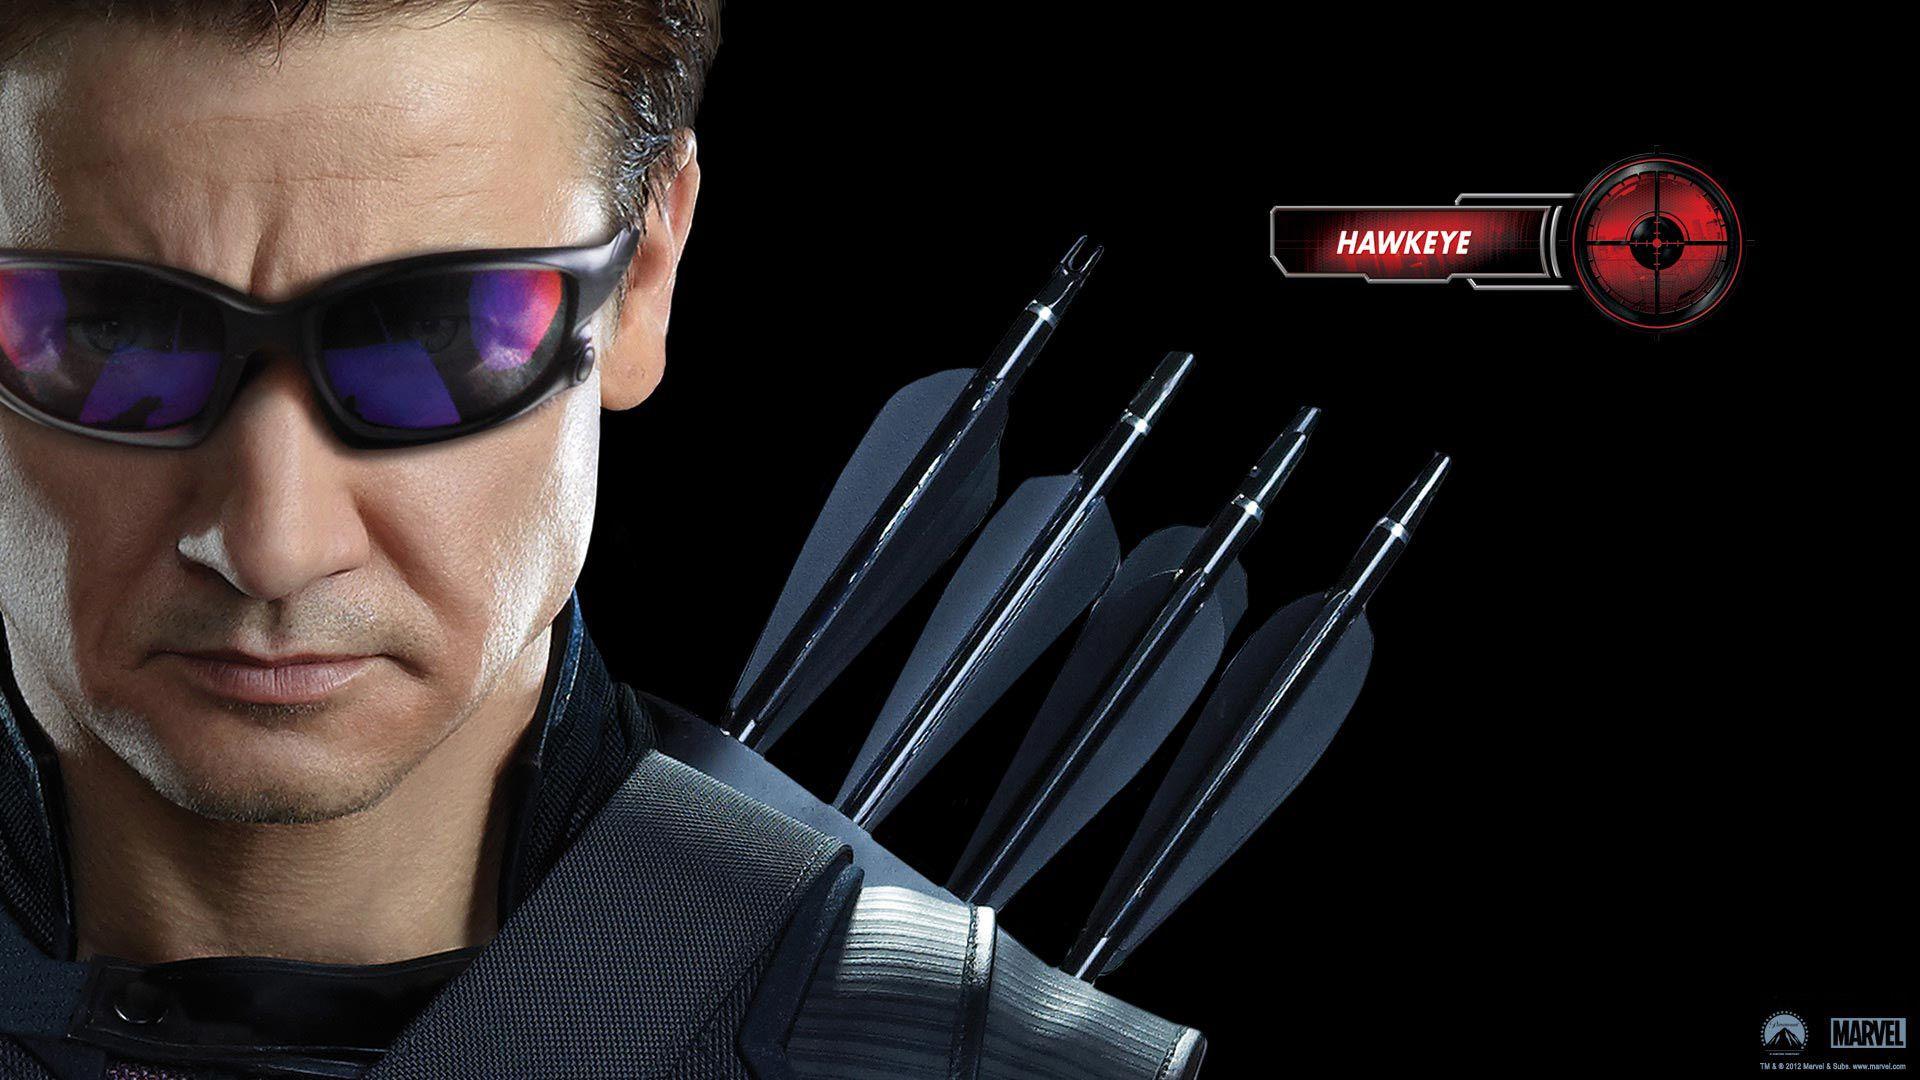 hawkeye in avengers movie wallpaper hd - http://imashon/w/movie